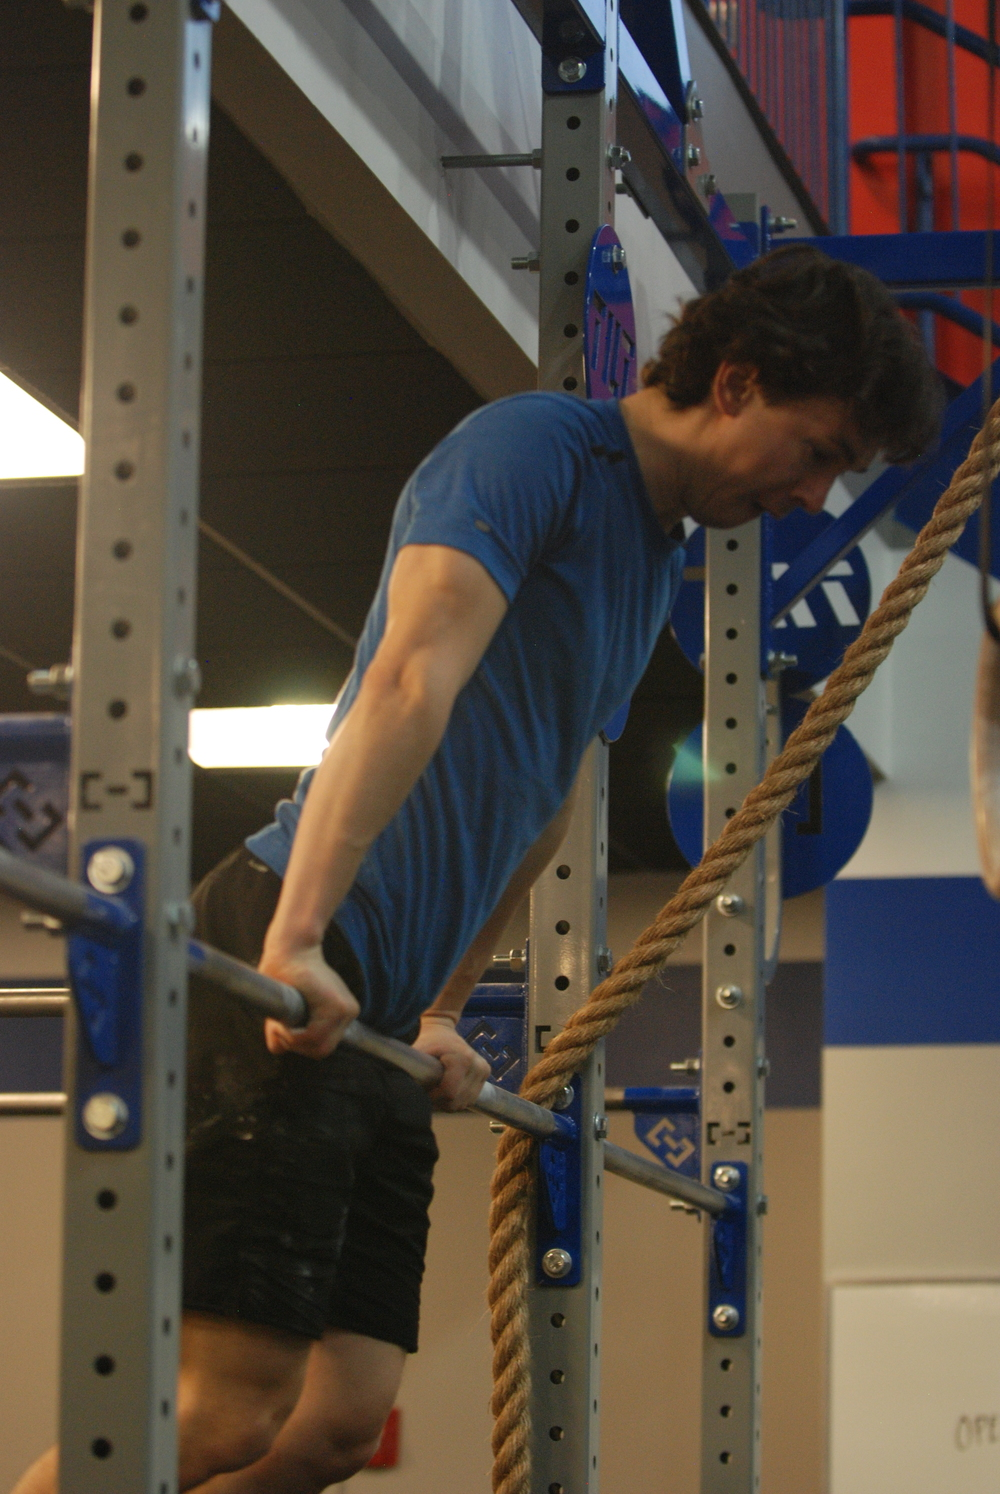 Ed making those bar muscle ups look easy!